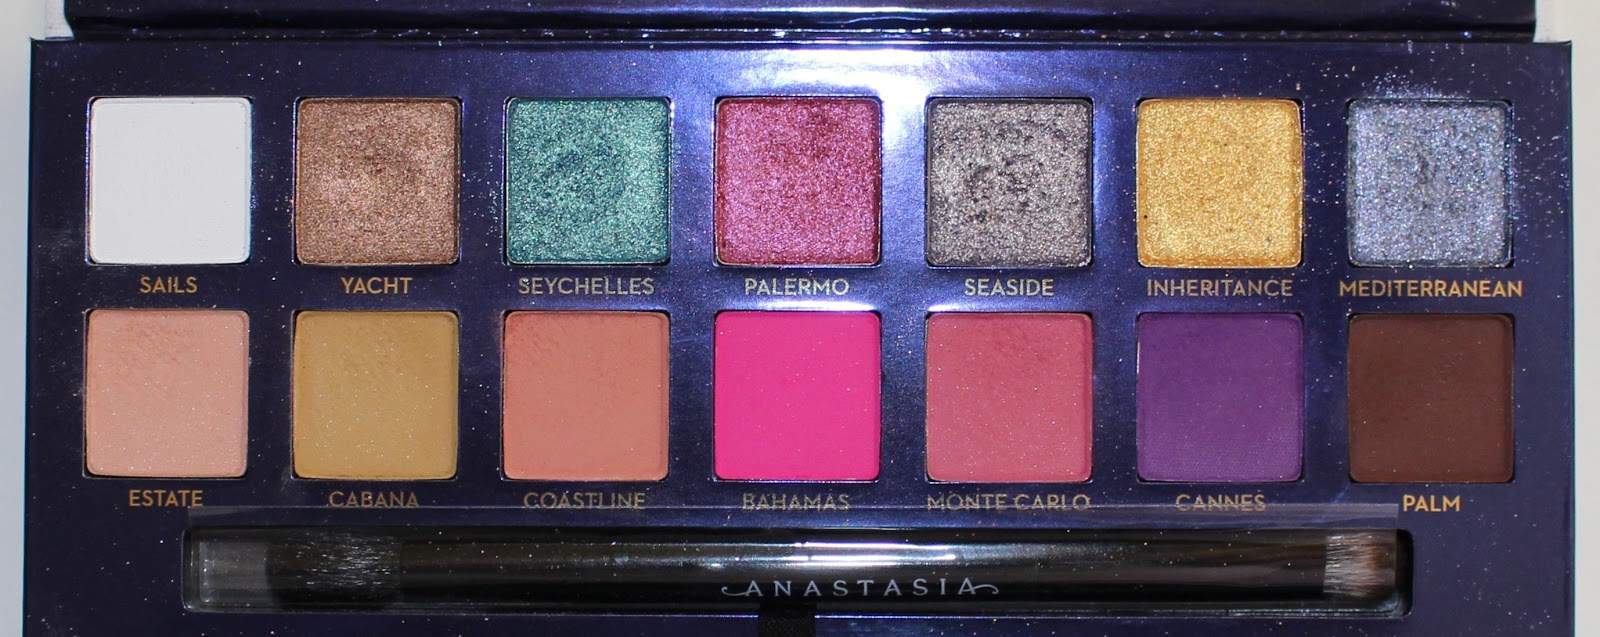 Anti-Haul Blog: What Im Not Buying: Anastasia Beverly